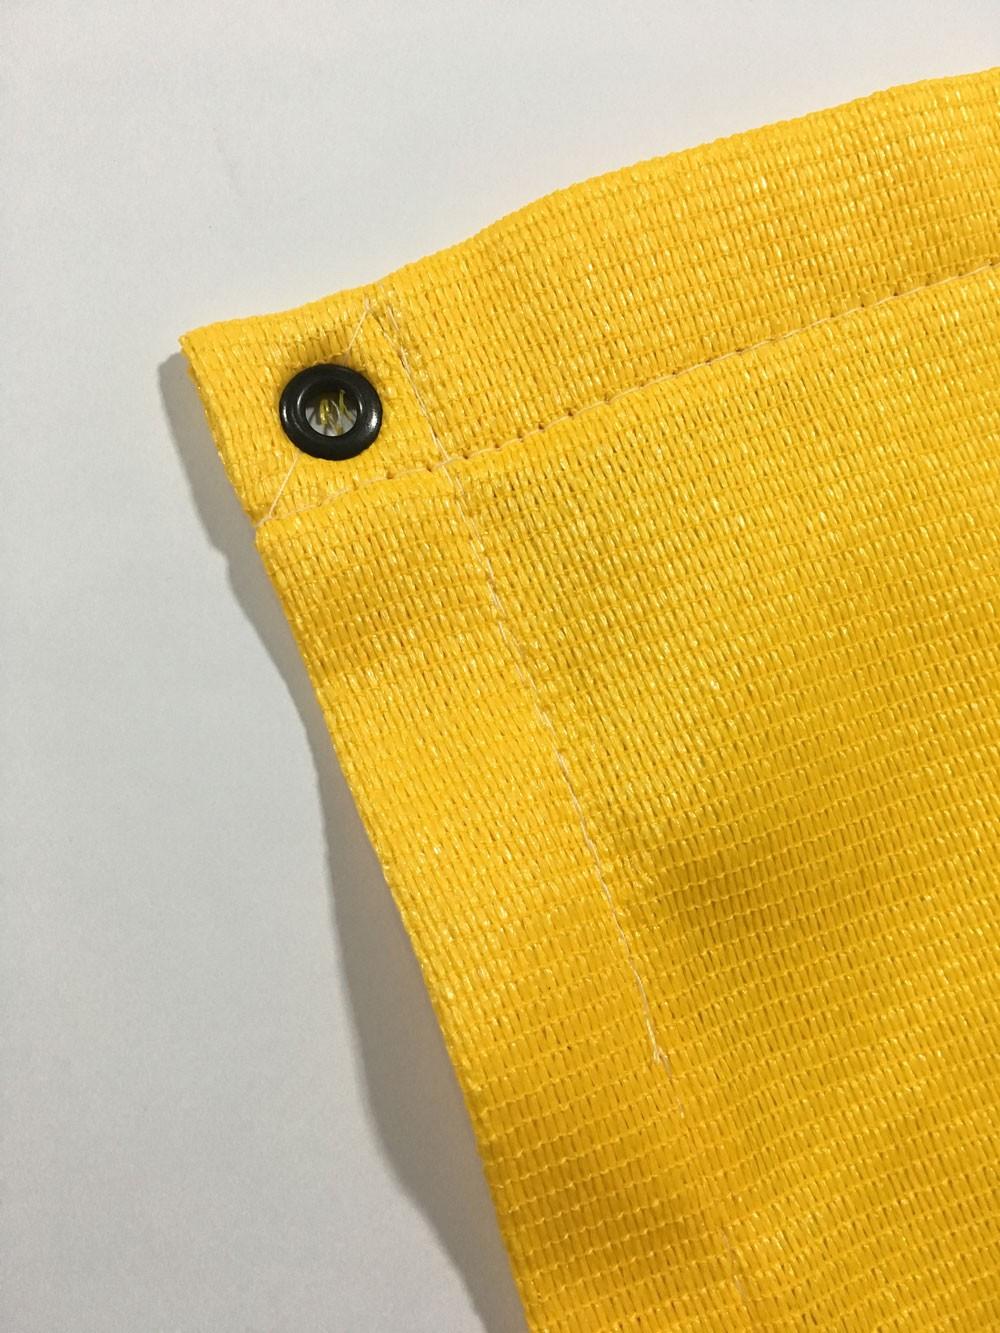 Tela Toldo Sombreamento Shade Amarelo Retangular 2x2m